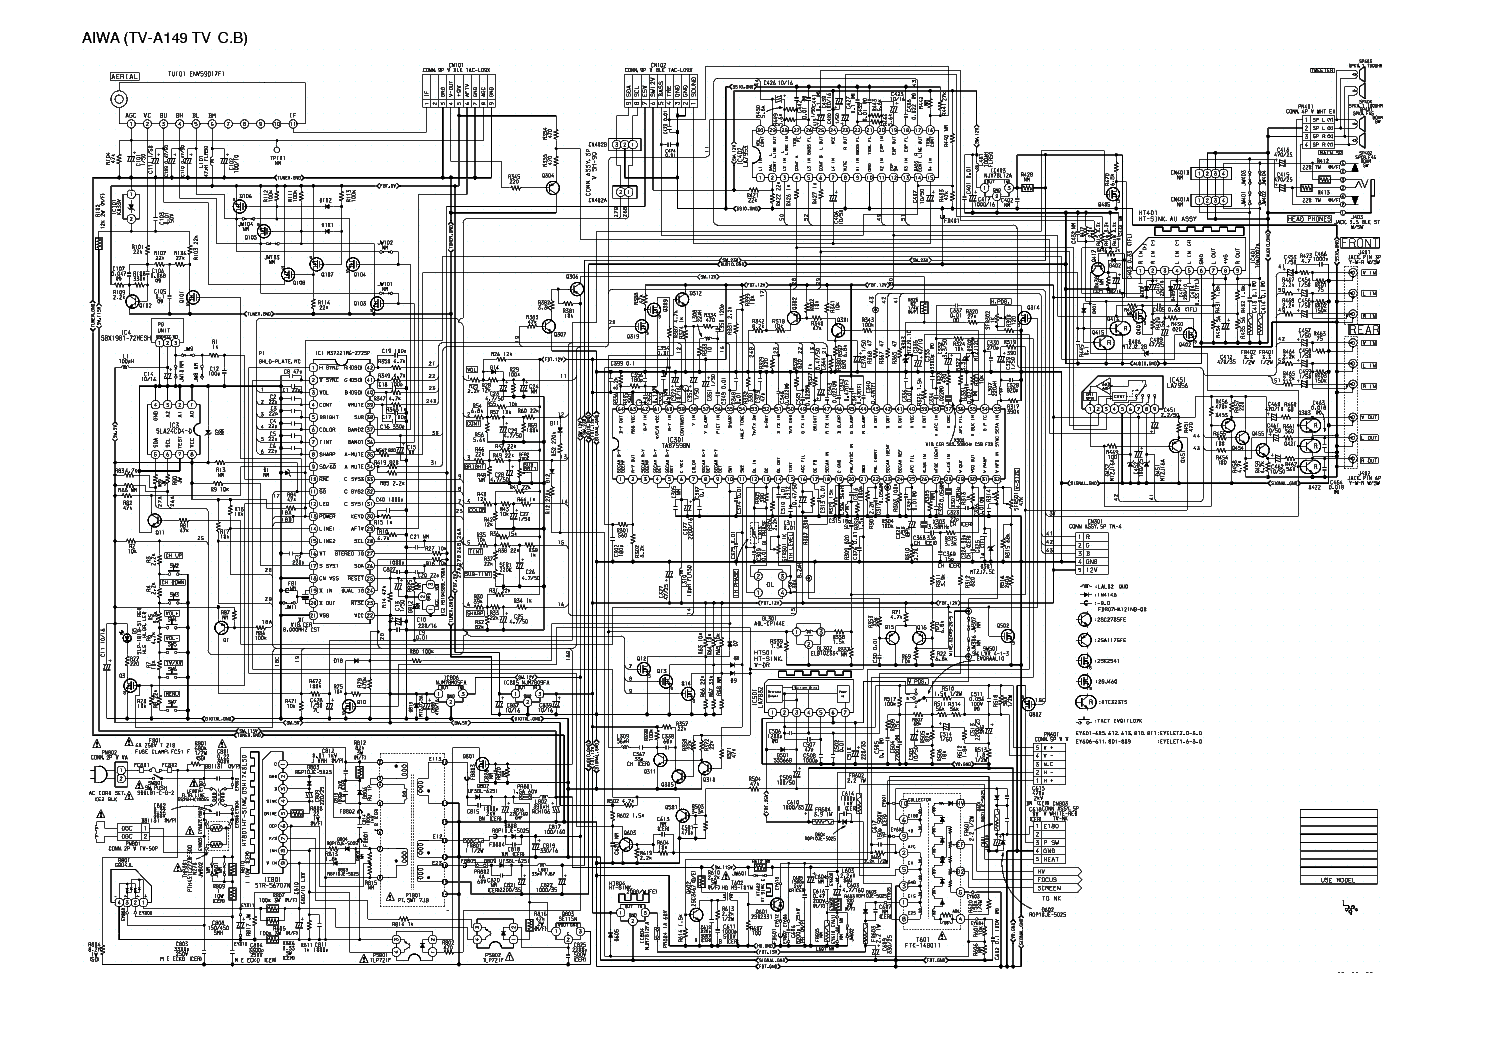 Aiwa Tv Circuit Diagram Wiring And Hub Color Television Se141 Type K Eg Schematic C1400 Chassis Cp 005a Service Manual Download Schematics Rh Elektrotanya Com Am Radio Block